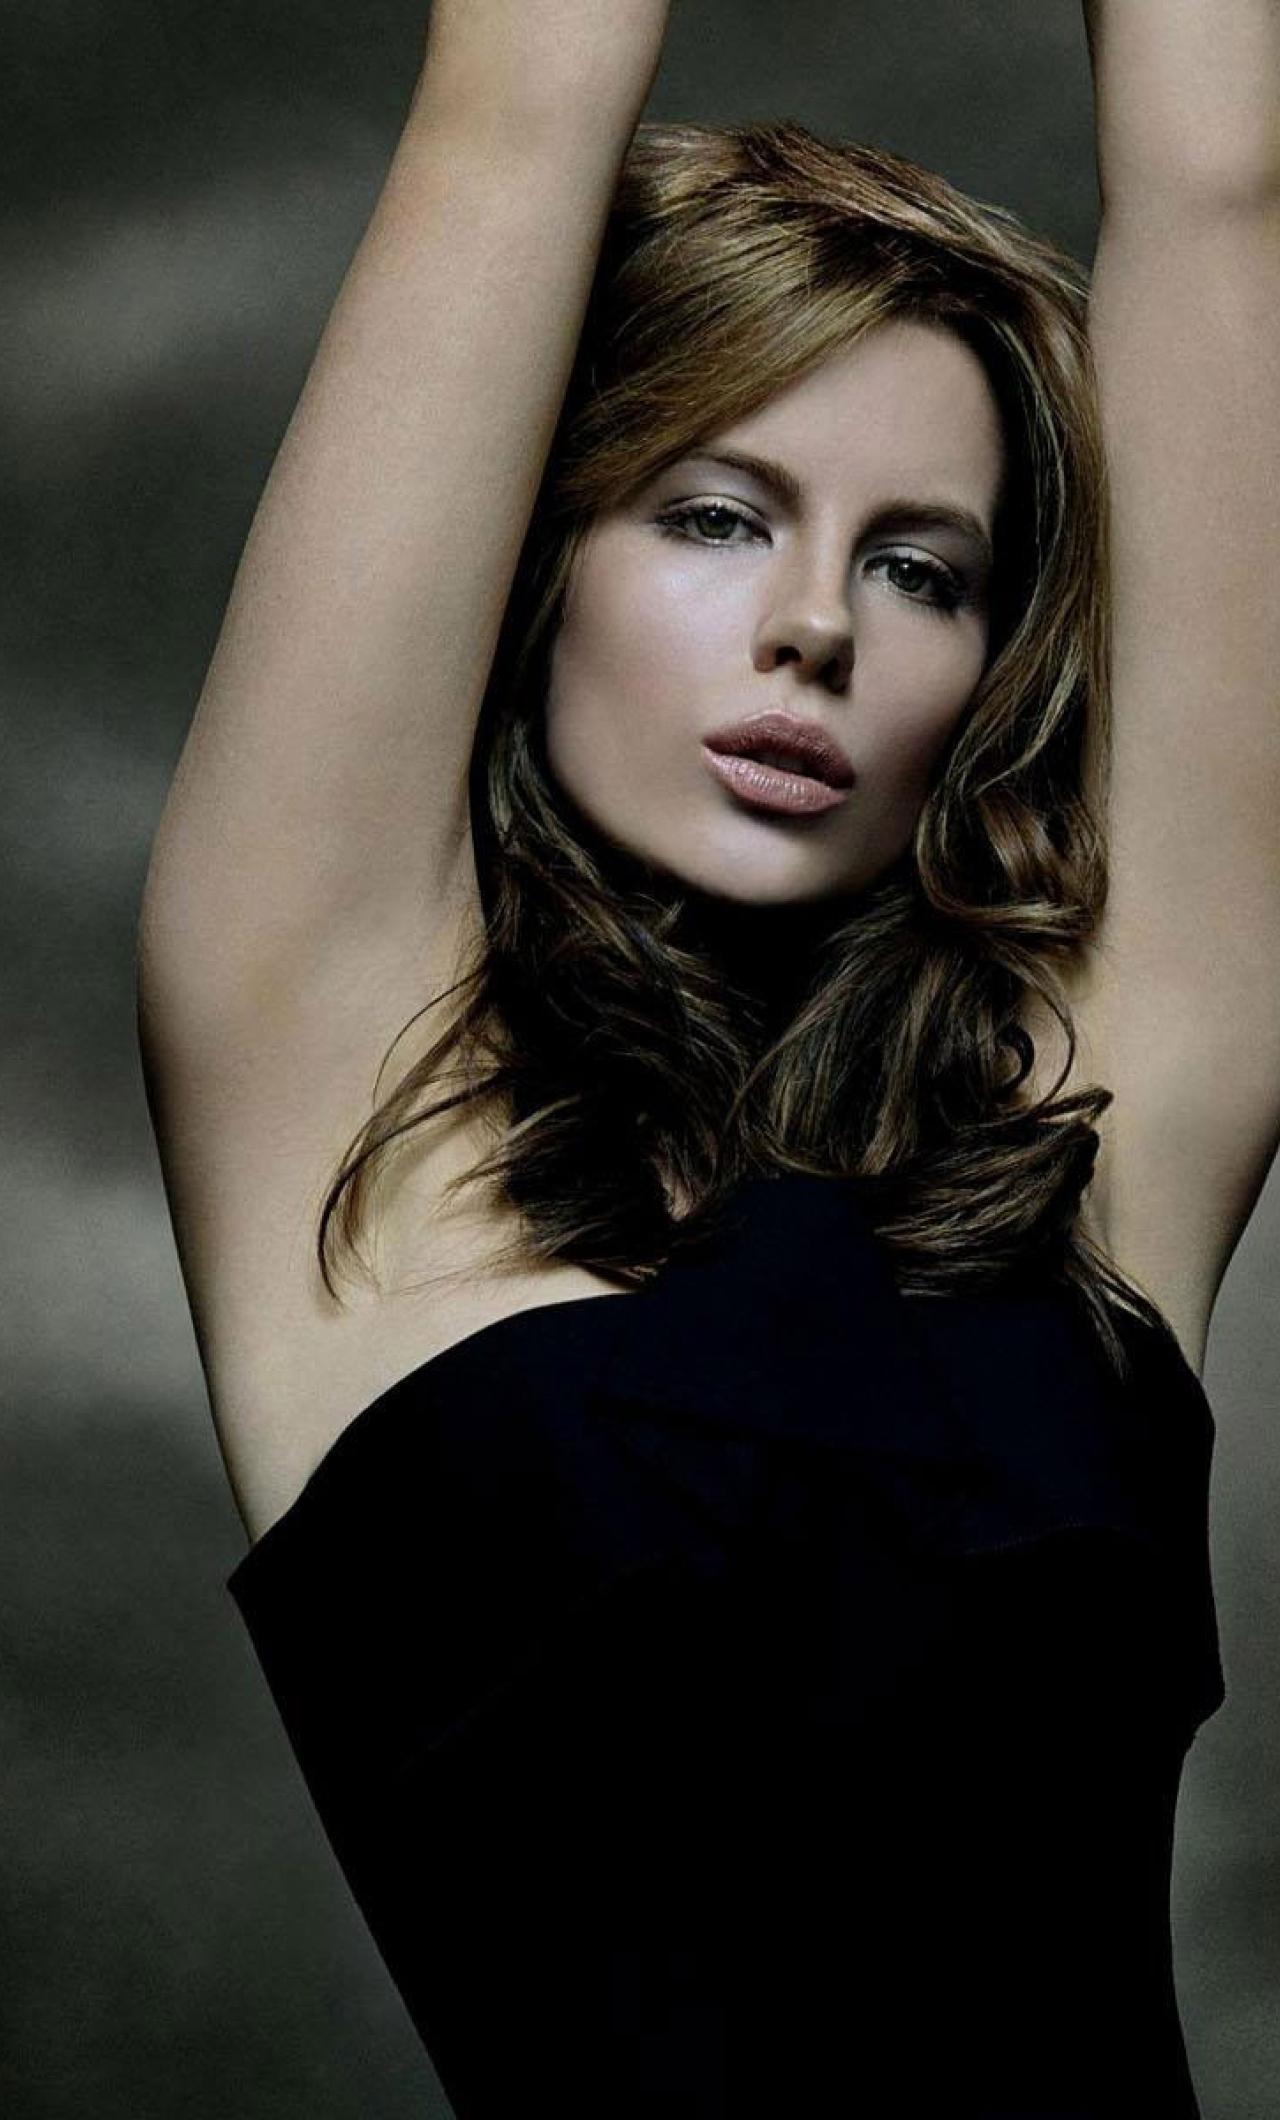 kate beckinsale in gorgeous black dress photoshoot full